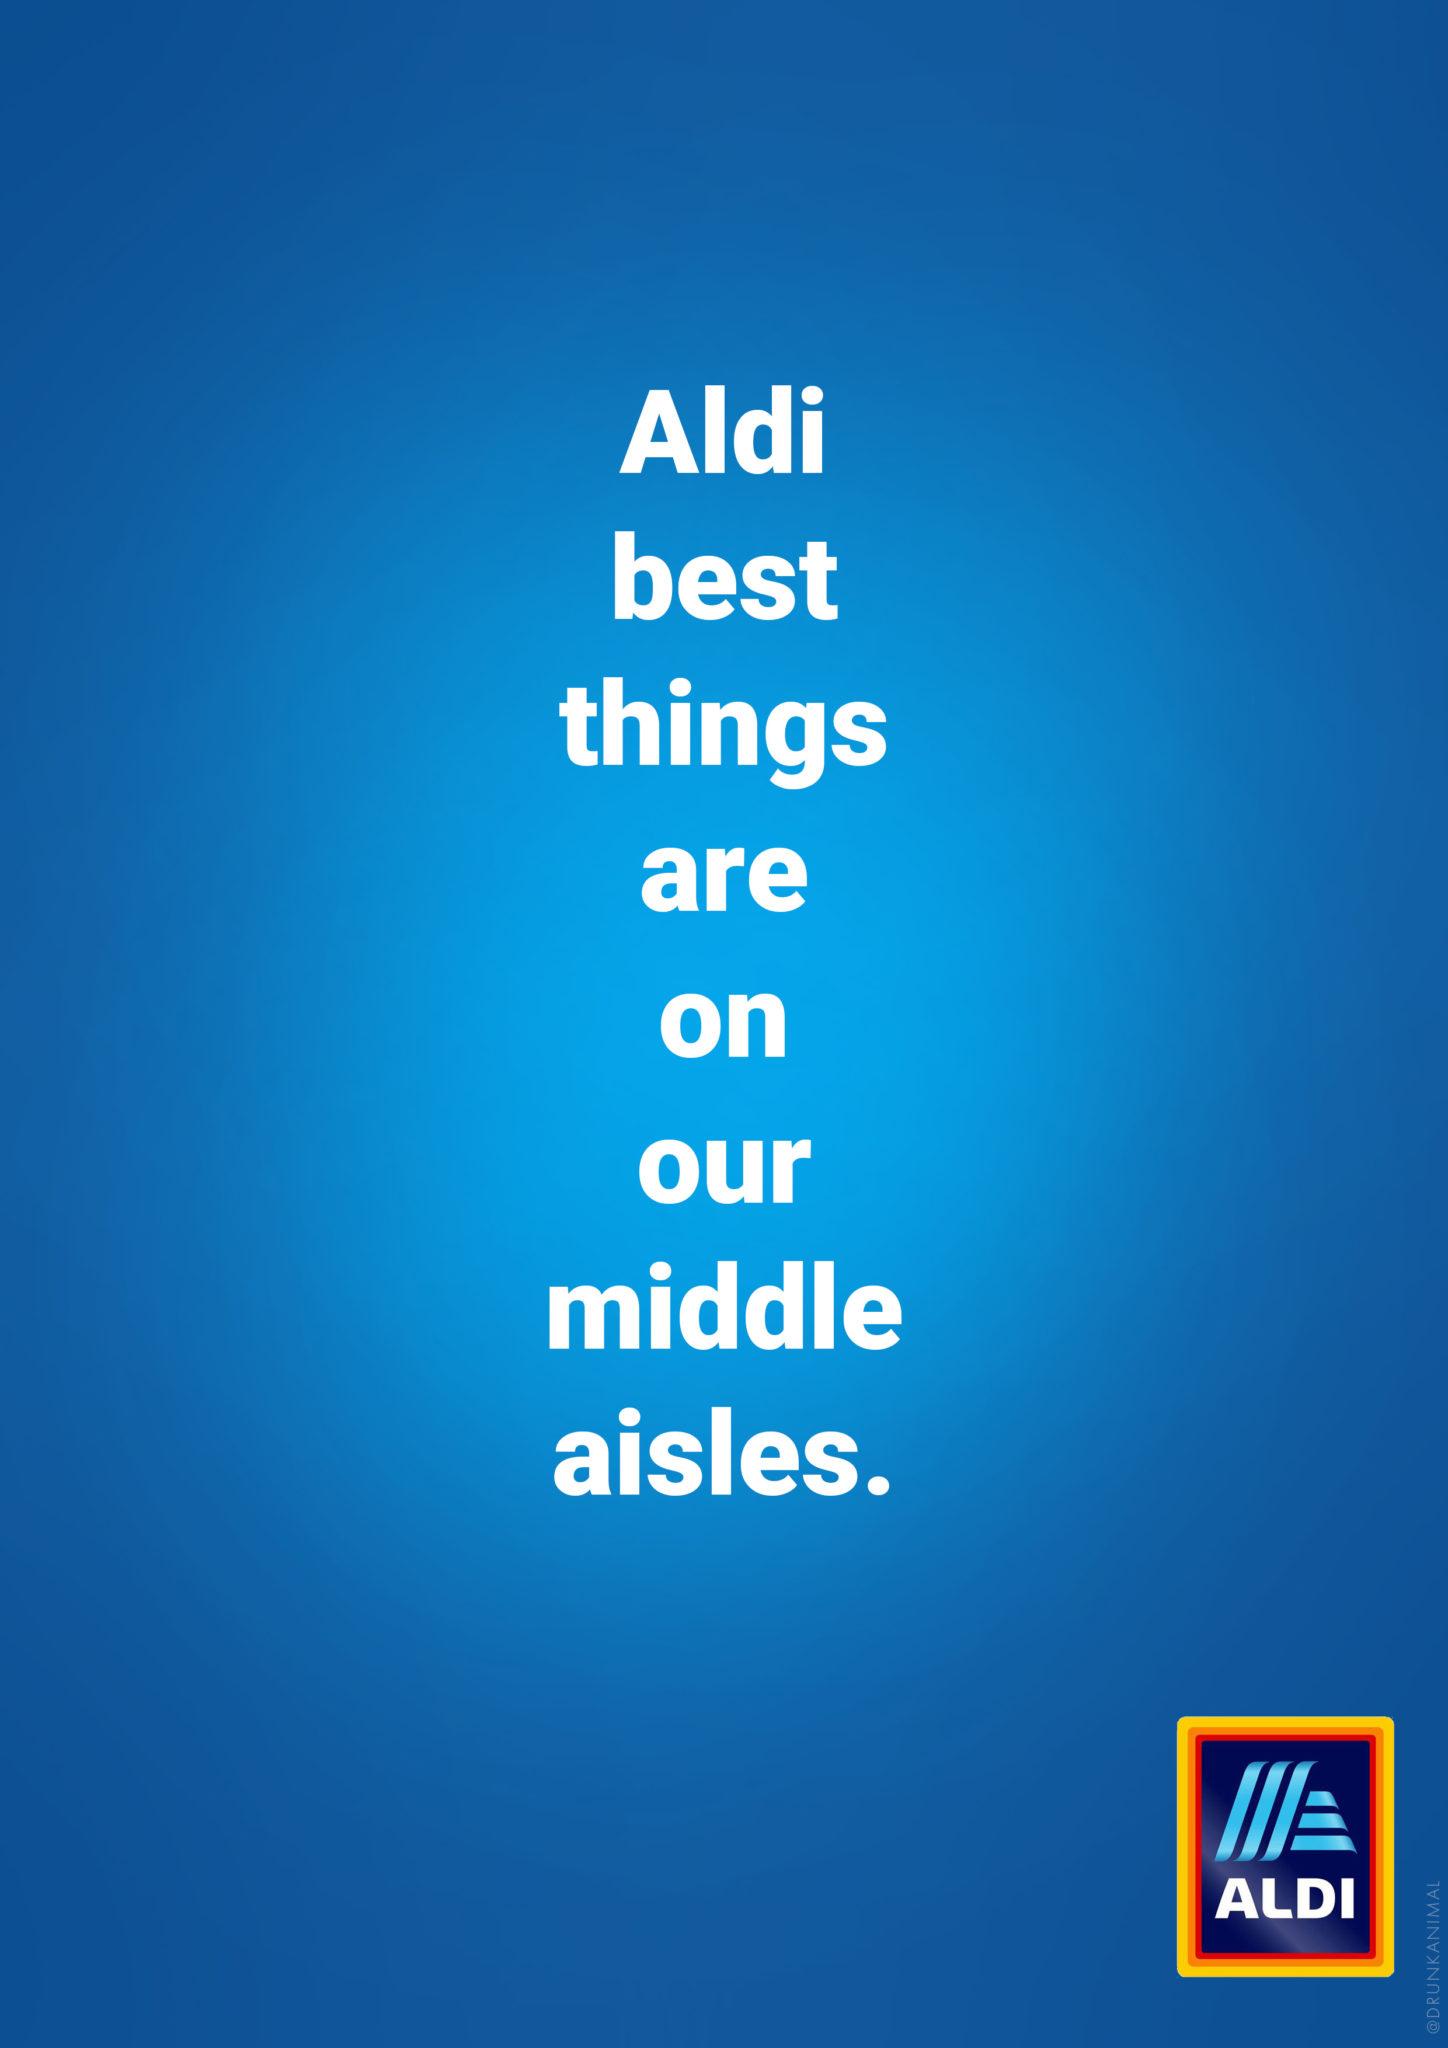 Aldi middle aisle advert